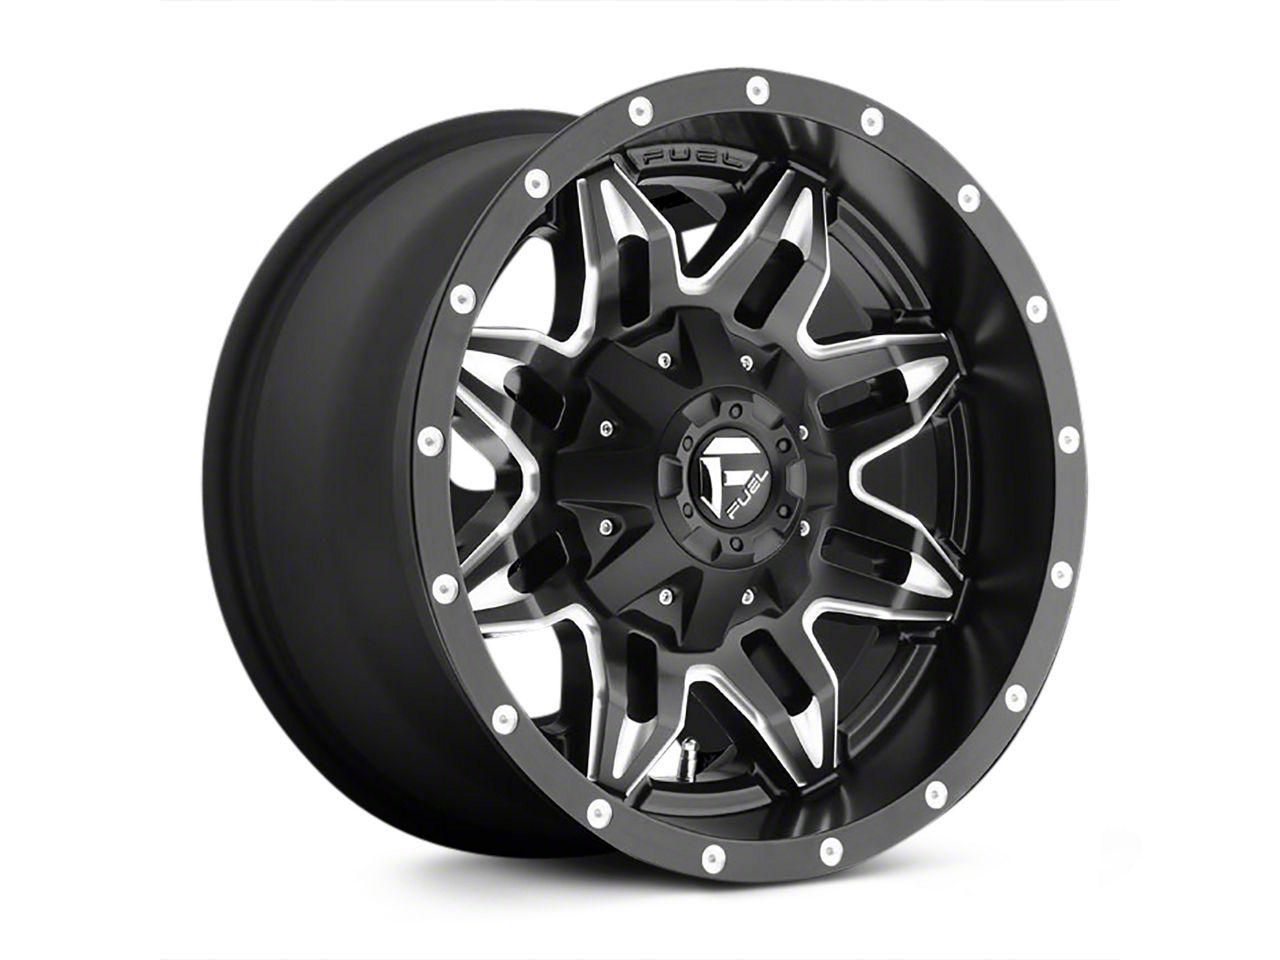 Fuel Wheels Lethal Black Milled Wheel - 18x9 (18-19 Jeep Wrangler JL)